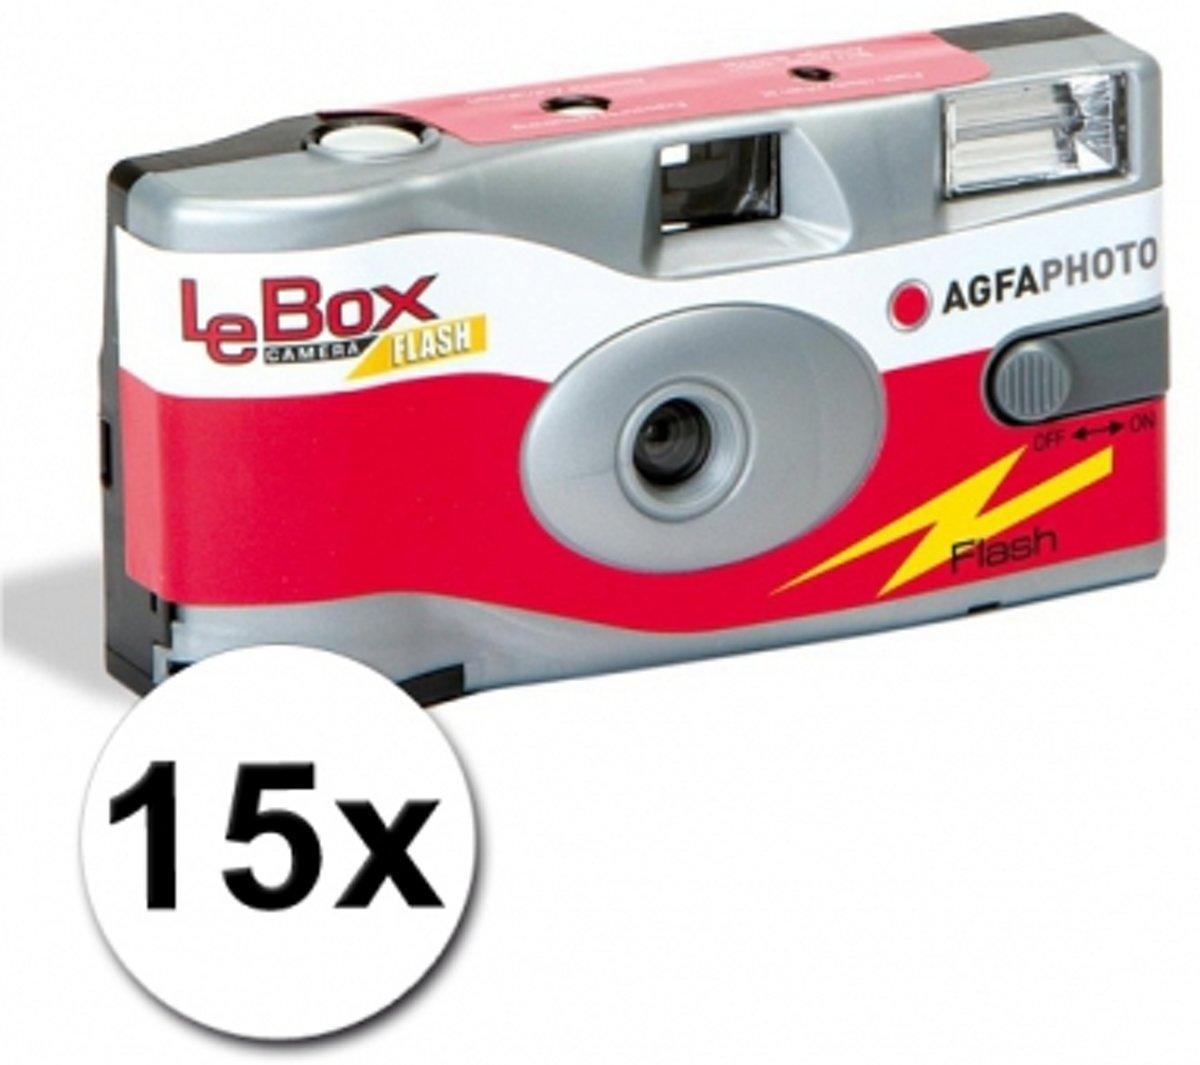 AgfaPhoto LeBox 400 27 flits - Multipack (15x) kopen